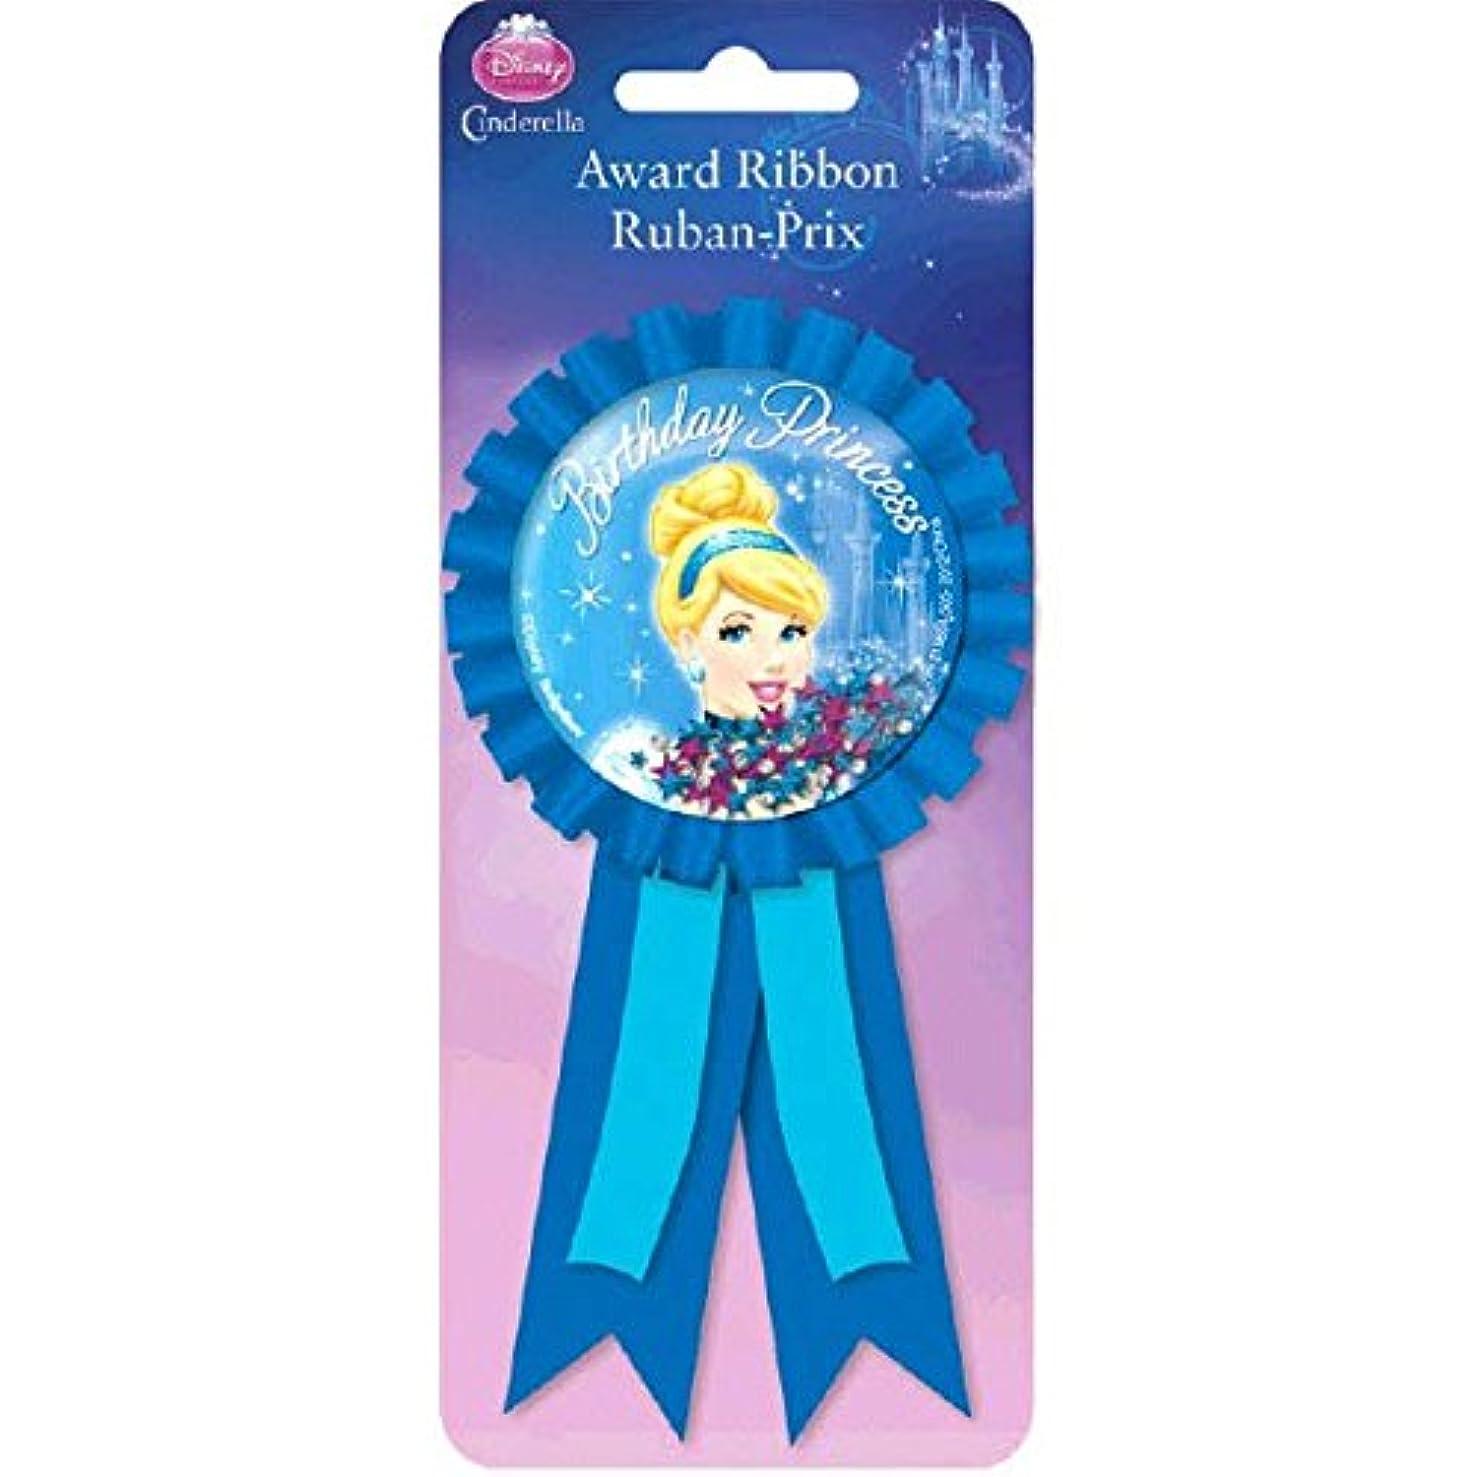 Confetti Pouch Award Ribbon | Disney Cinderella Collection | Birthday